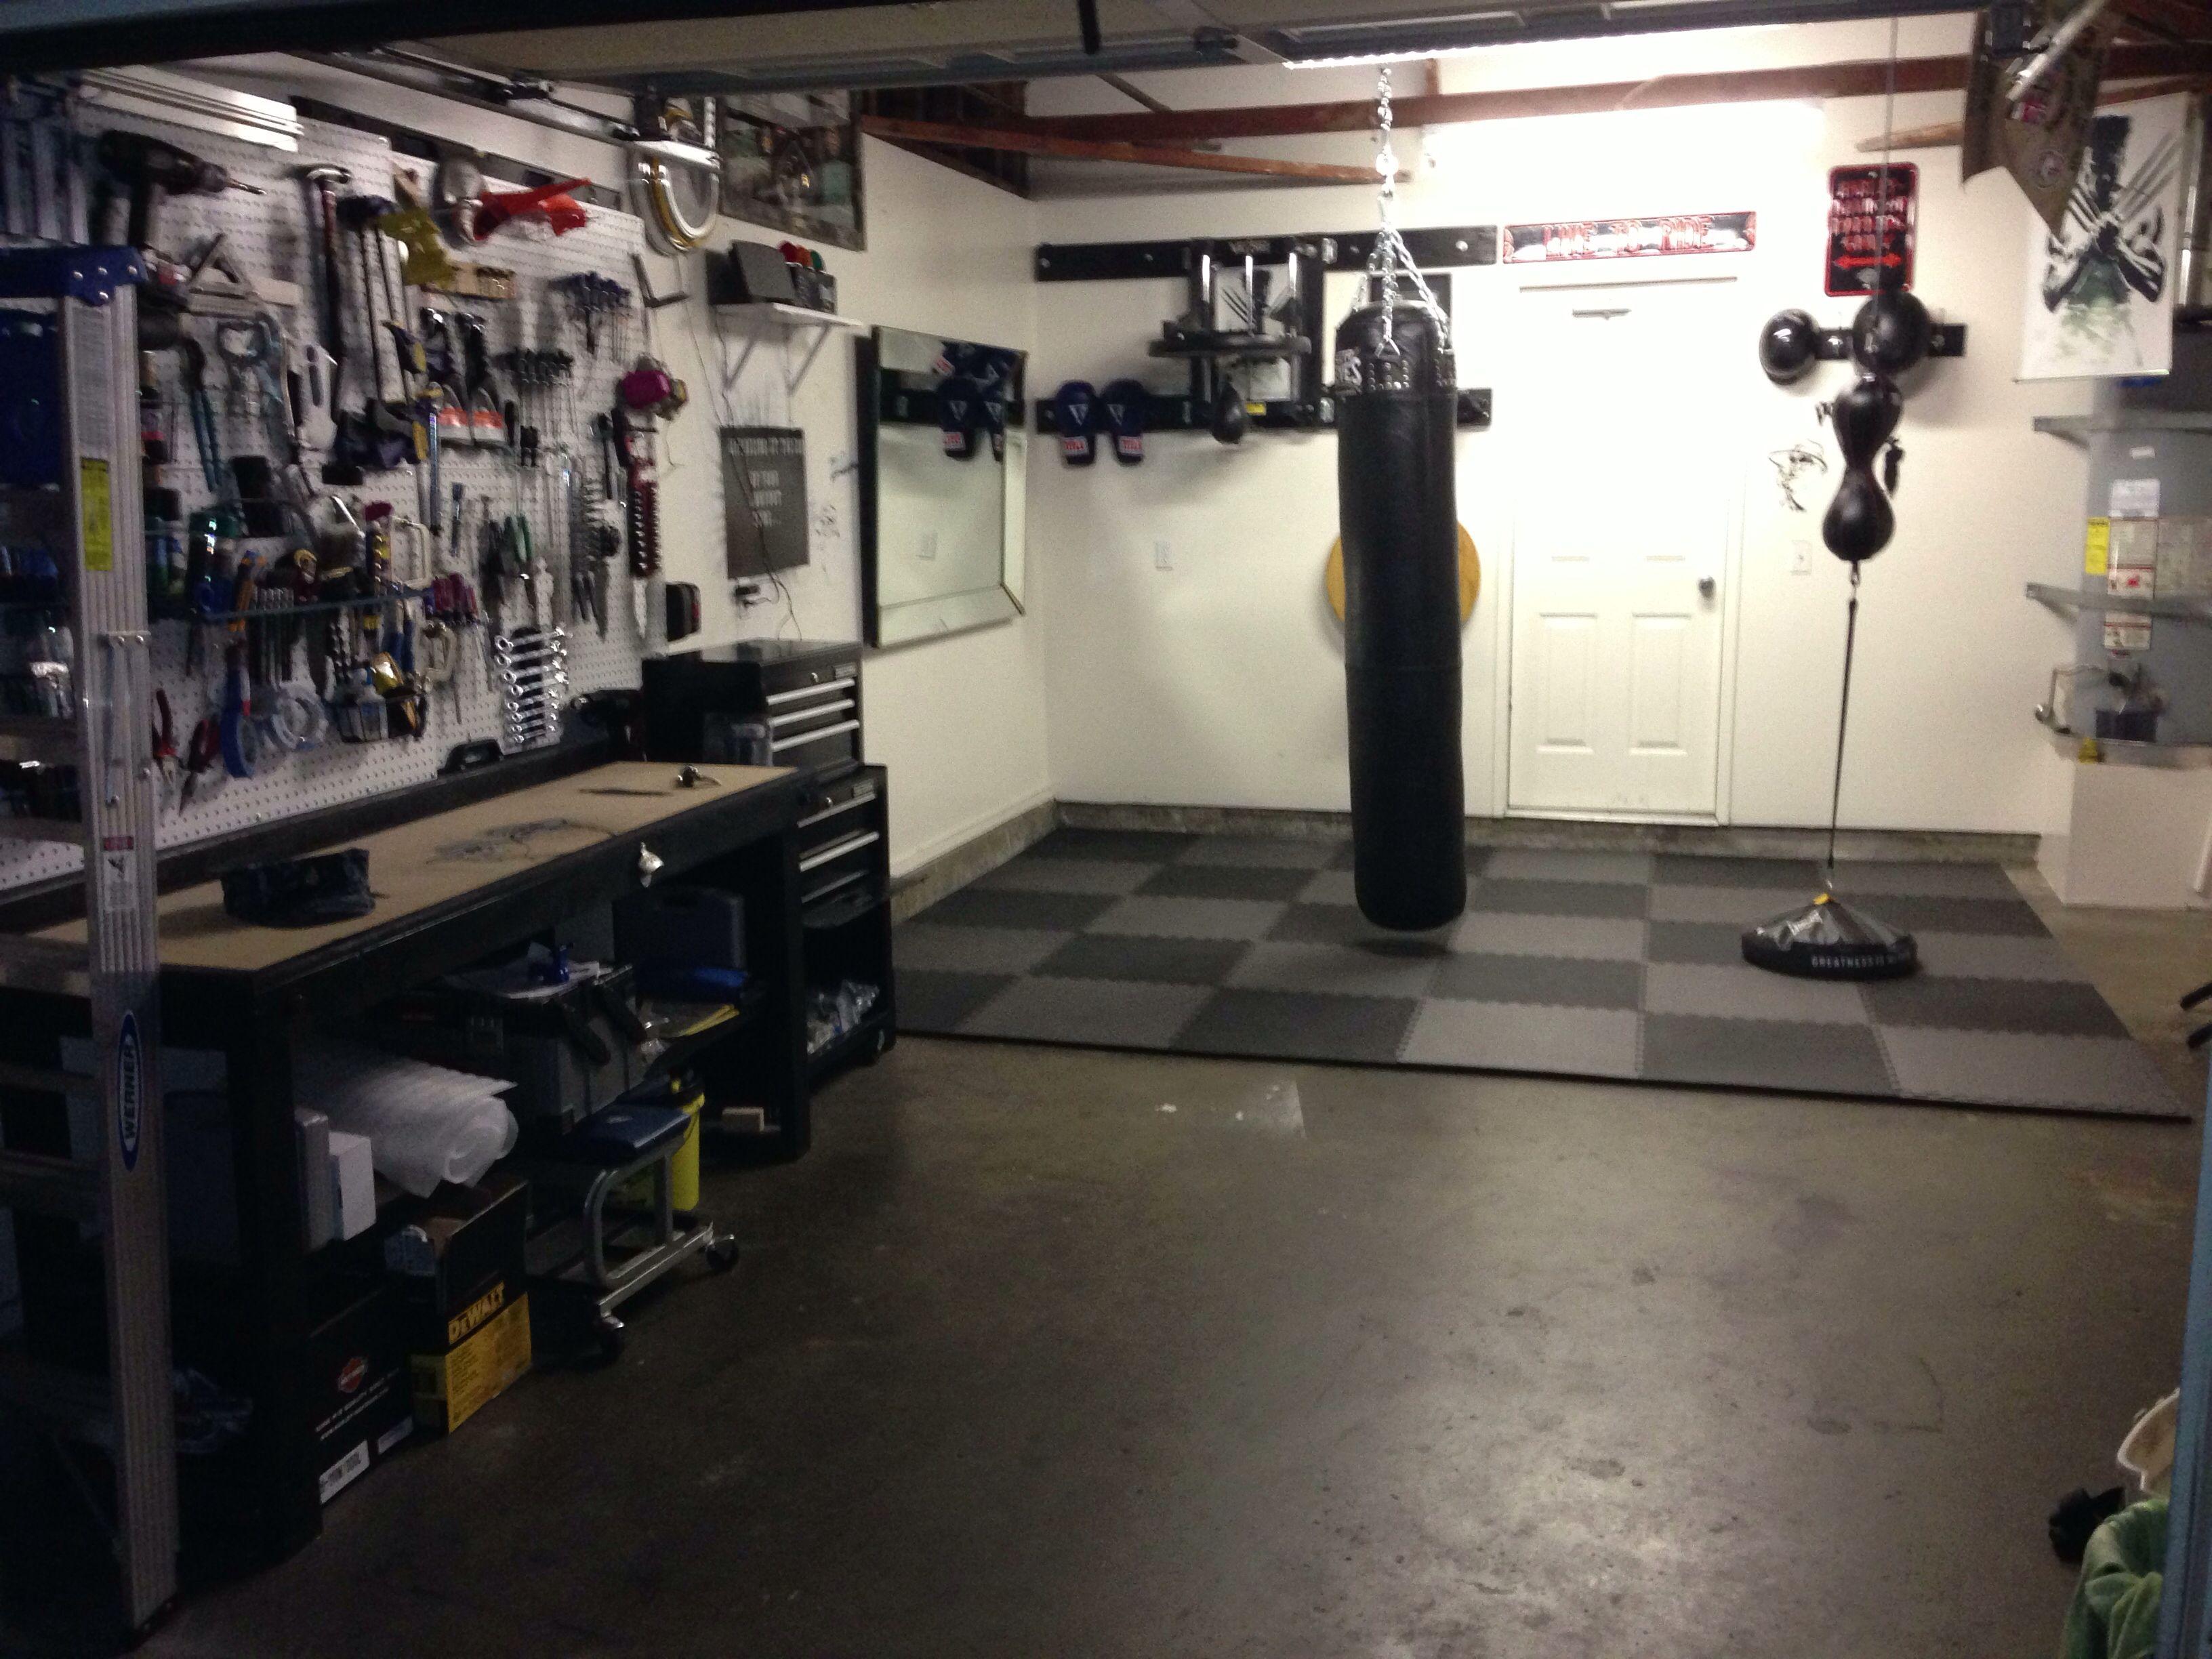 Speed Bag Platform Finally Mounted Alongside Additional Boxing Equipment Rubber Flooring